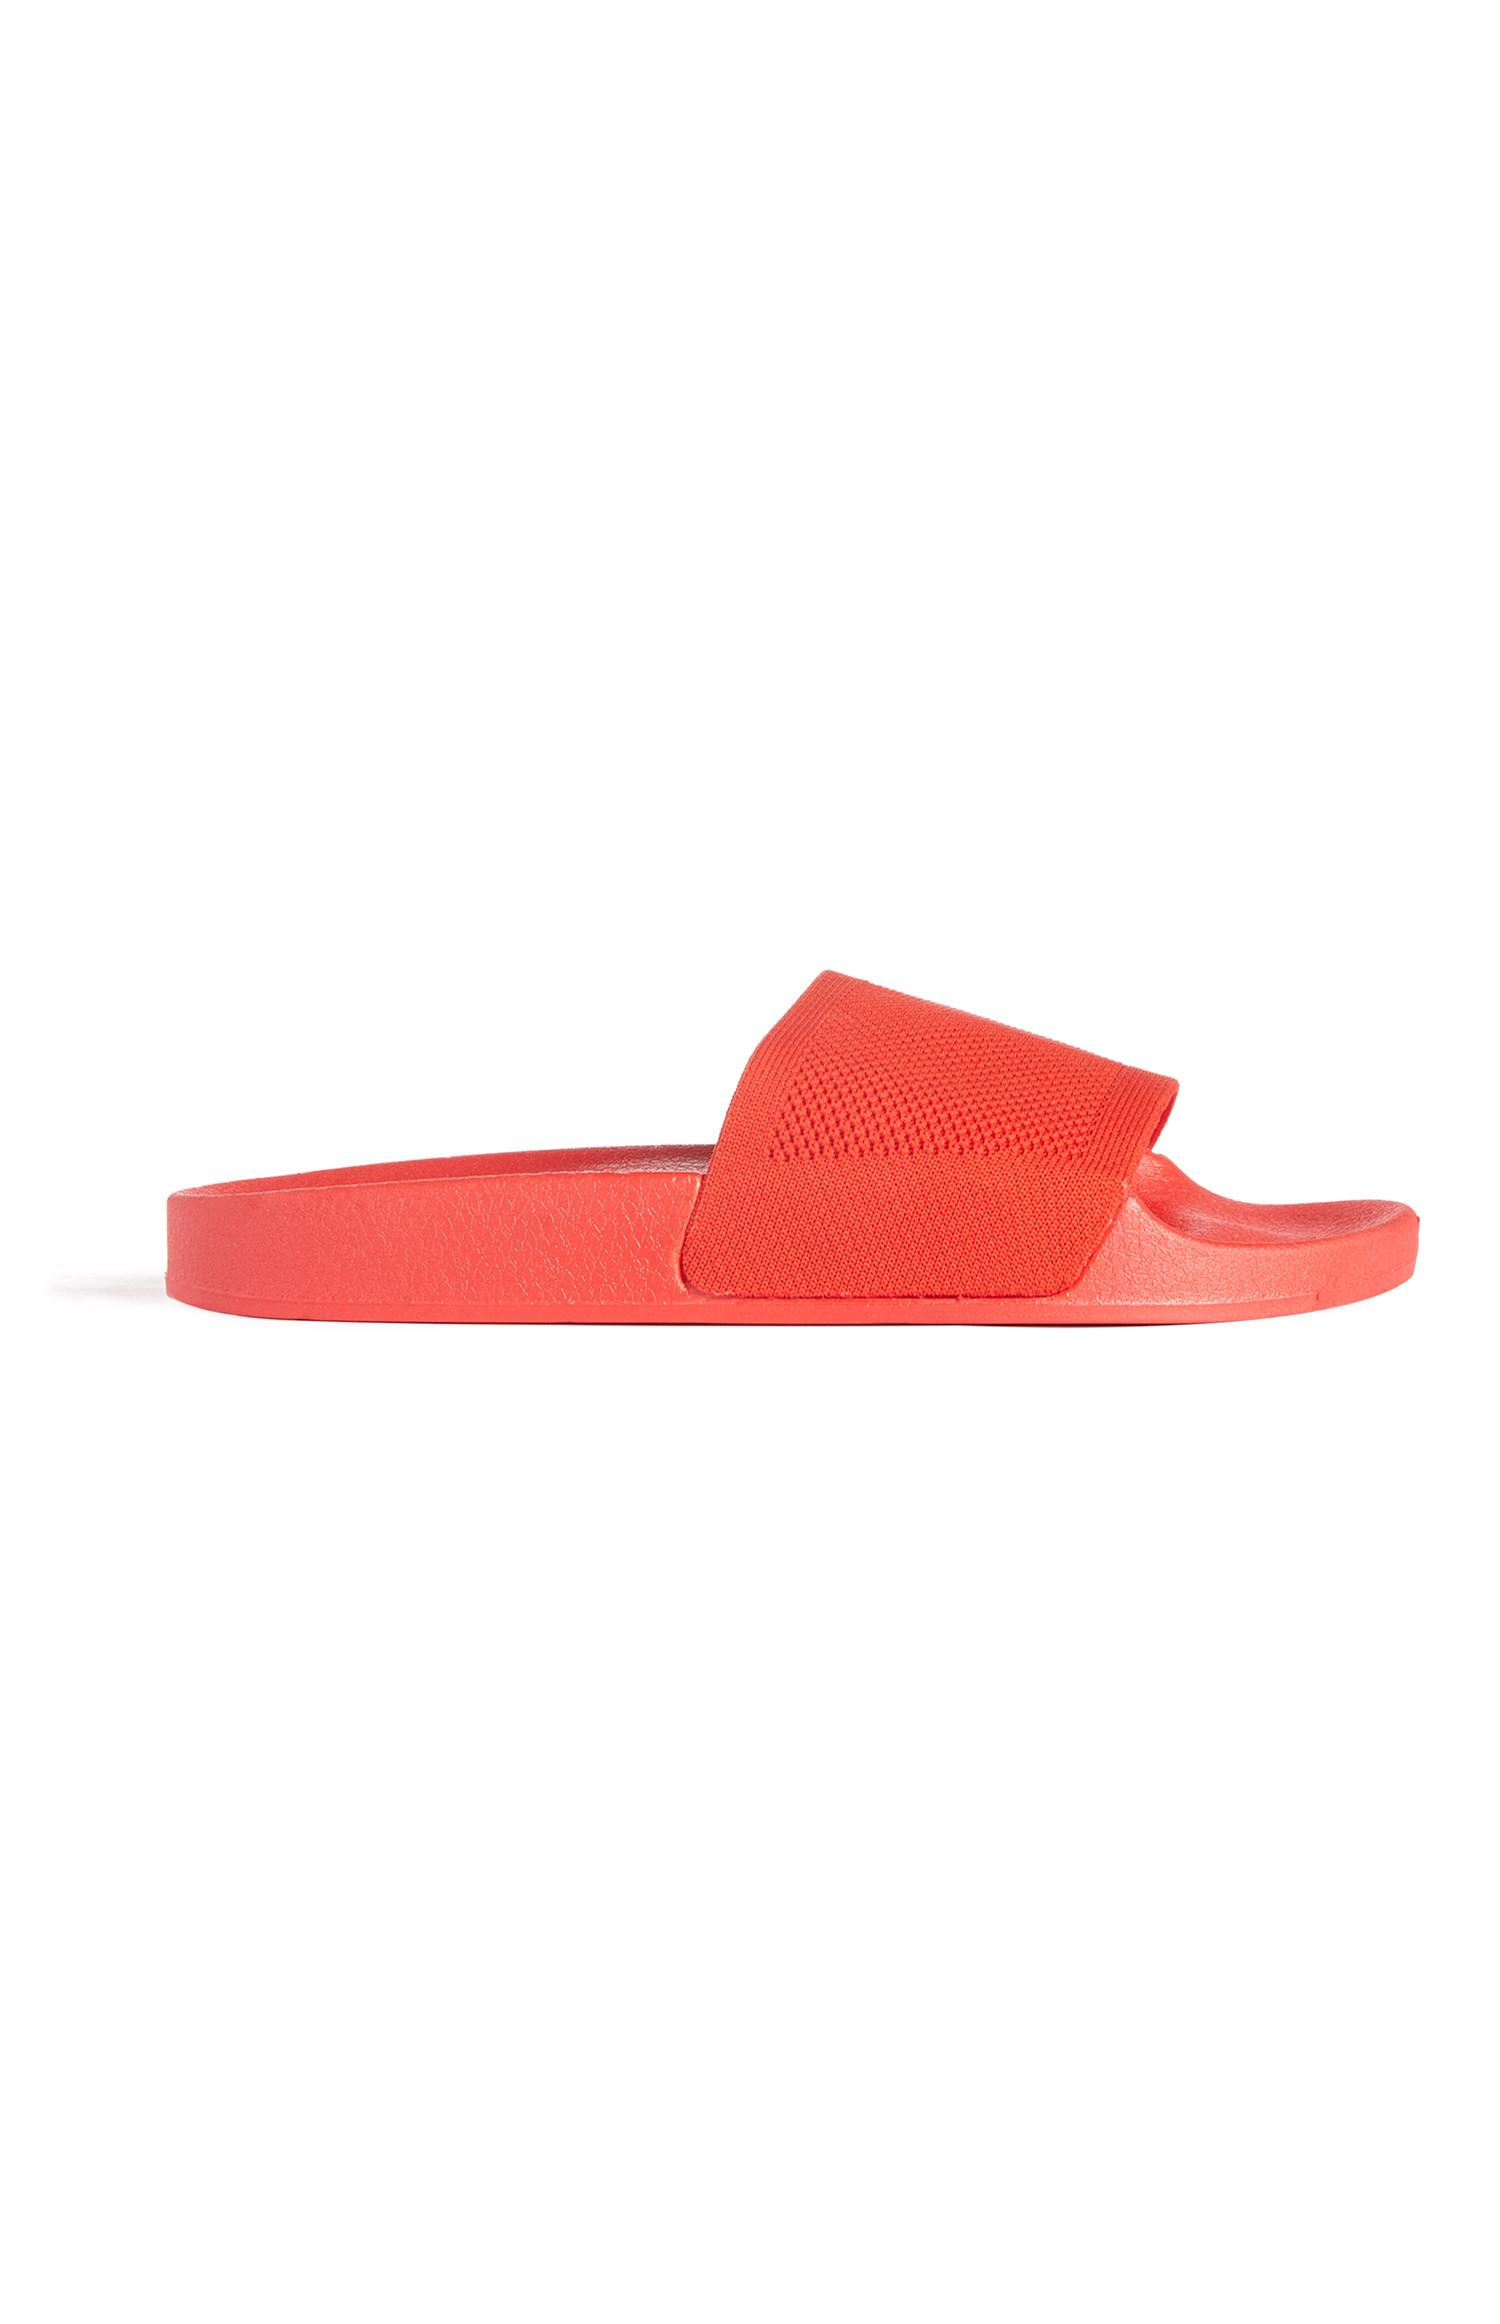 Rode gebreide slippers